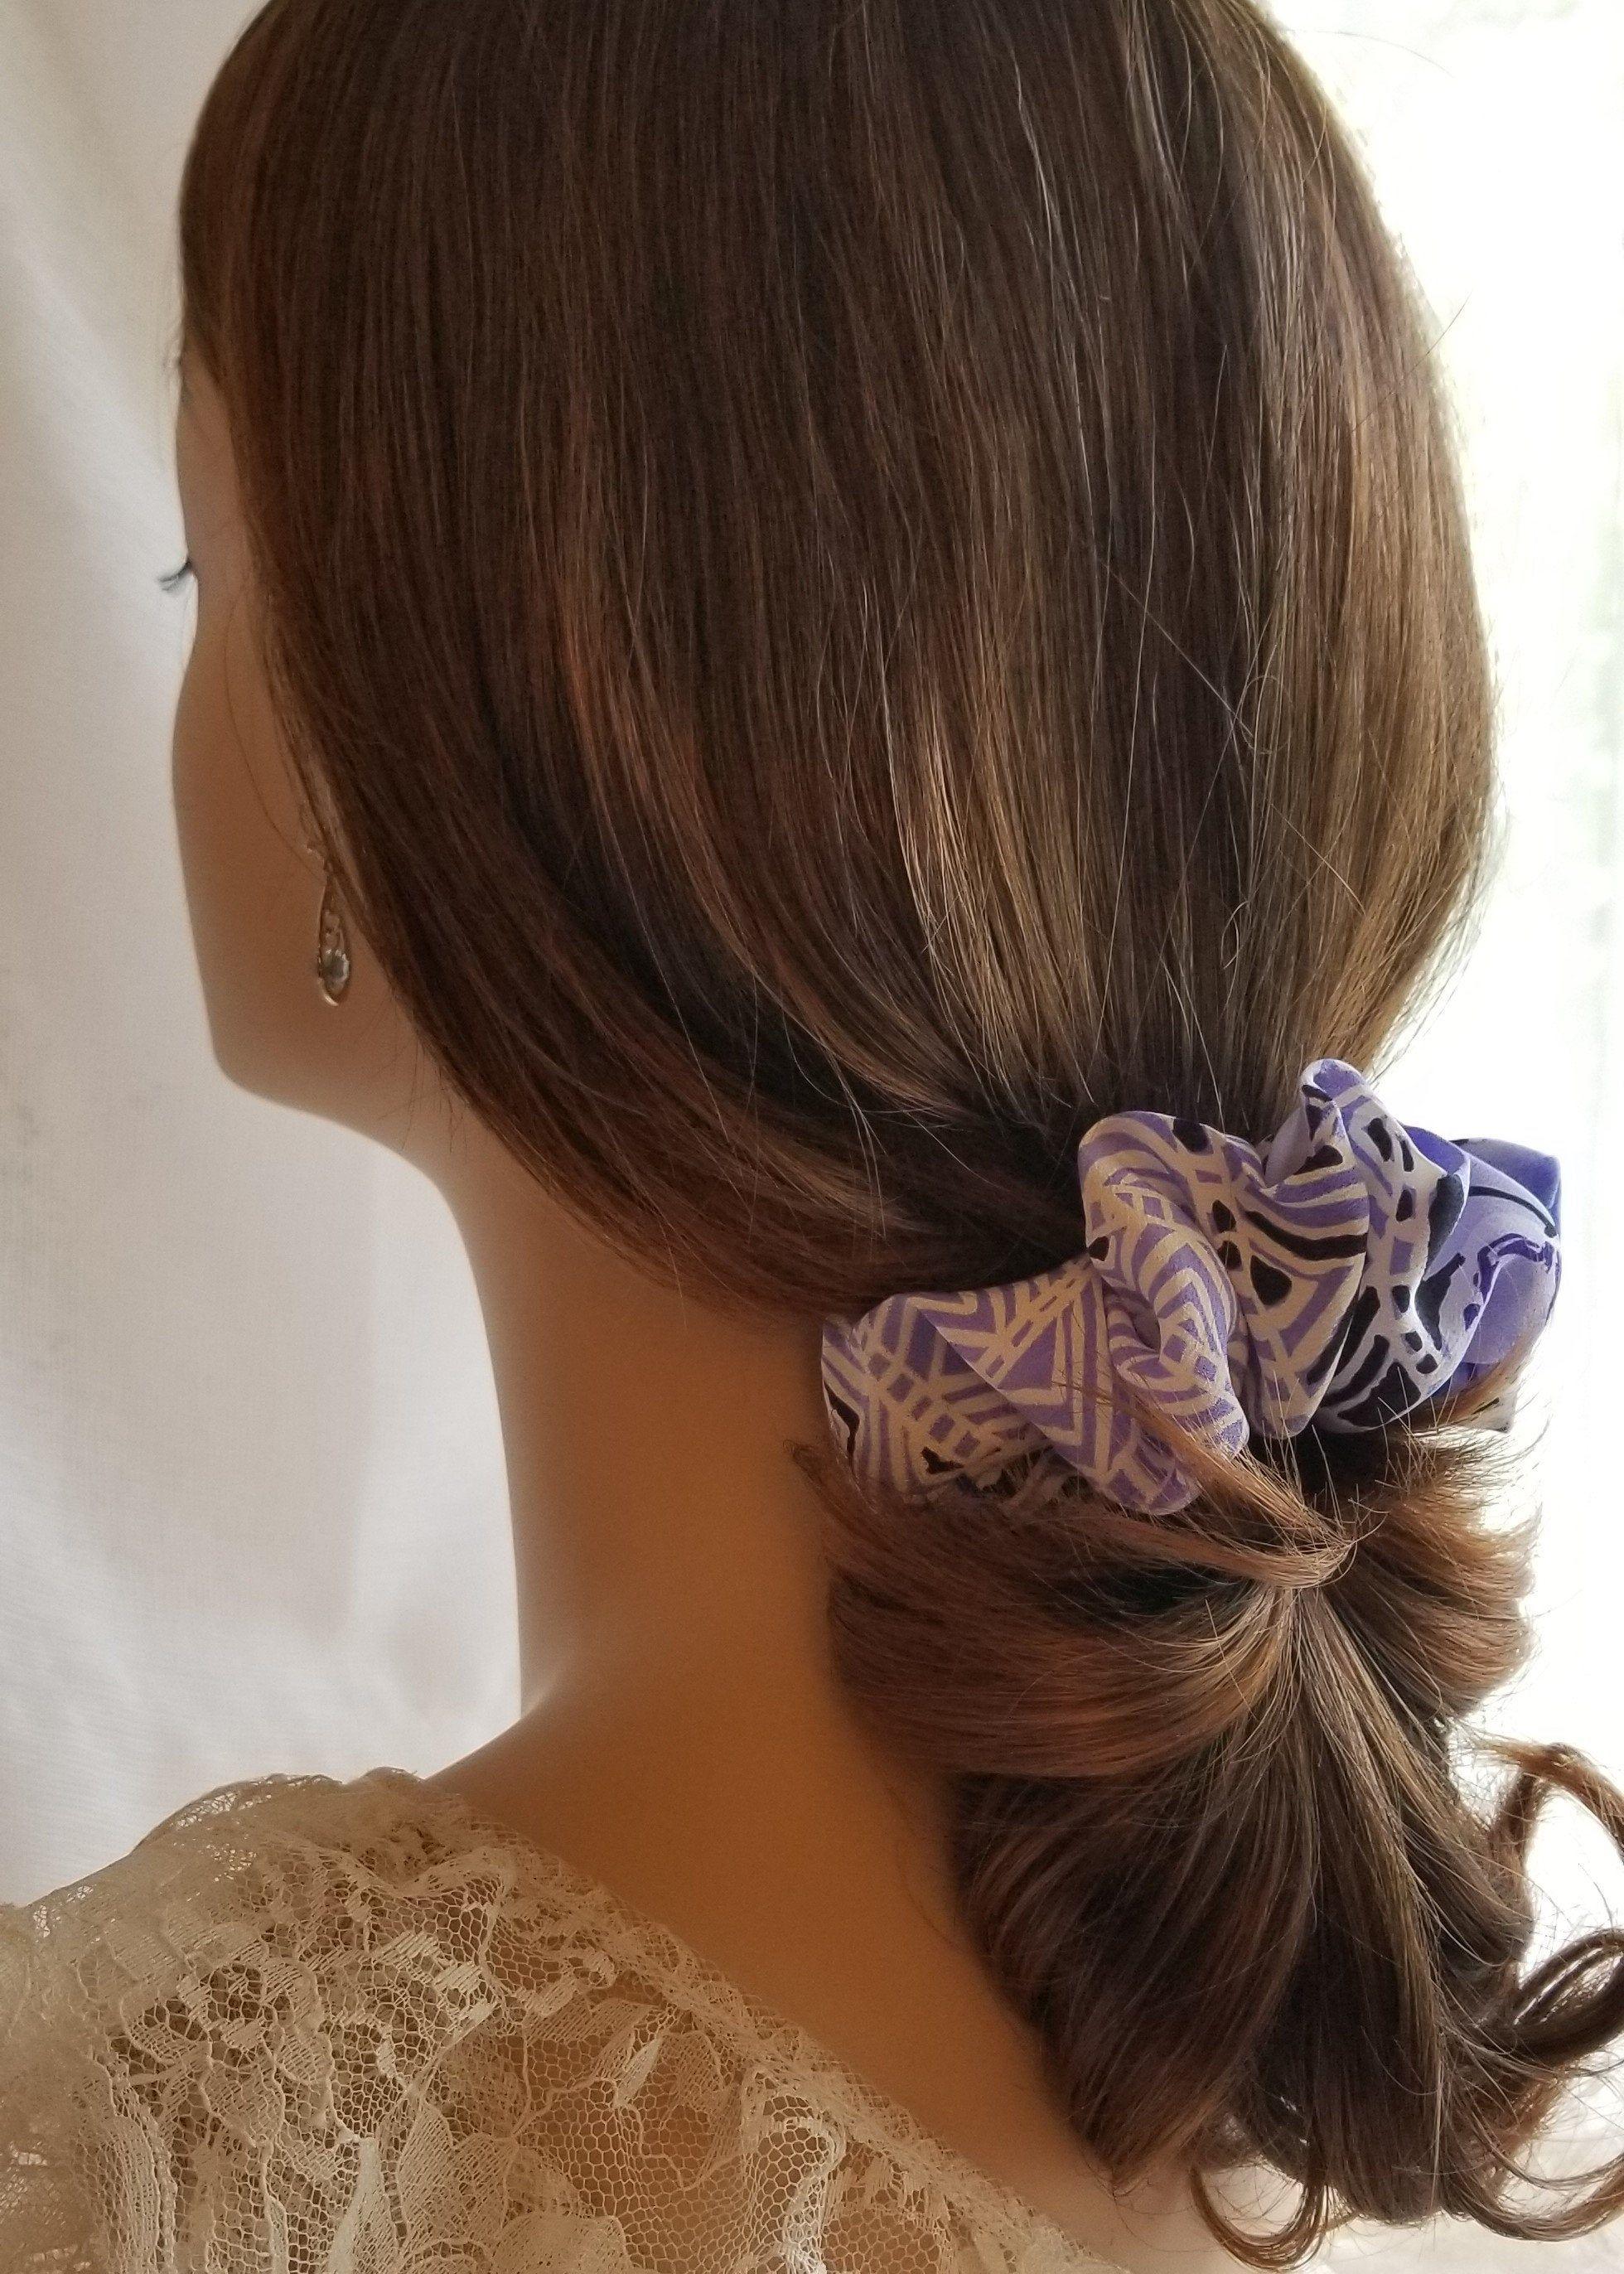 Silk Scrunchie Reversible 2 In 1 Pony Tail Holder Shades Of Etsy Scrunchie Hairstyles Ponytail Hair